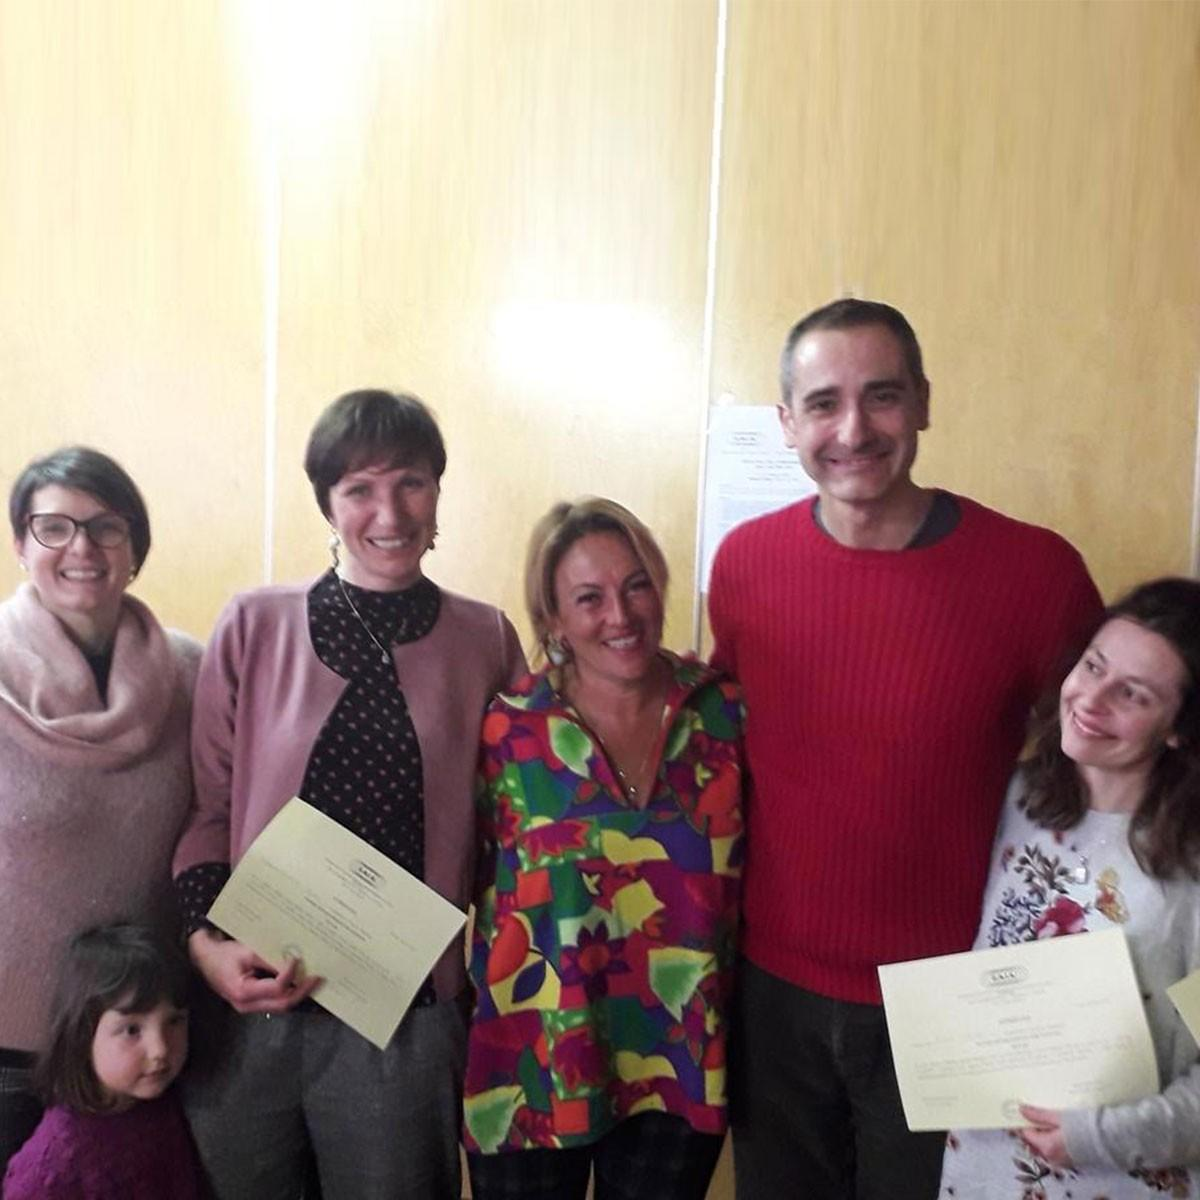 Parte del team di Biella Cresce insieme a Daniela Lucangeli dopo aver conseguito i diplomi a Nevegal